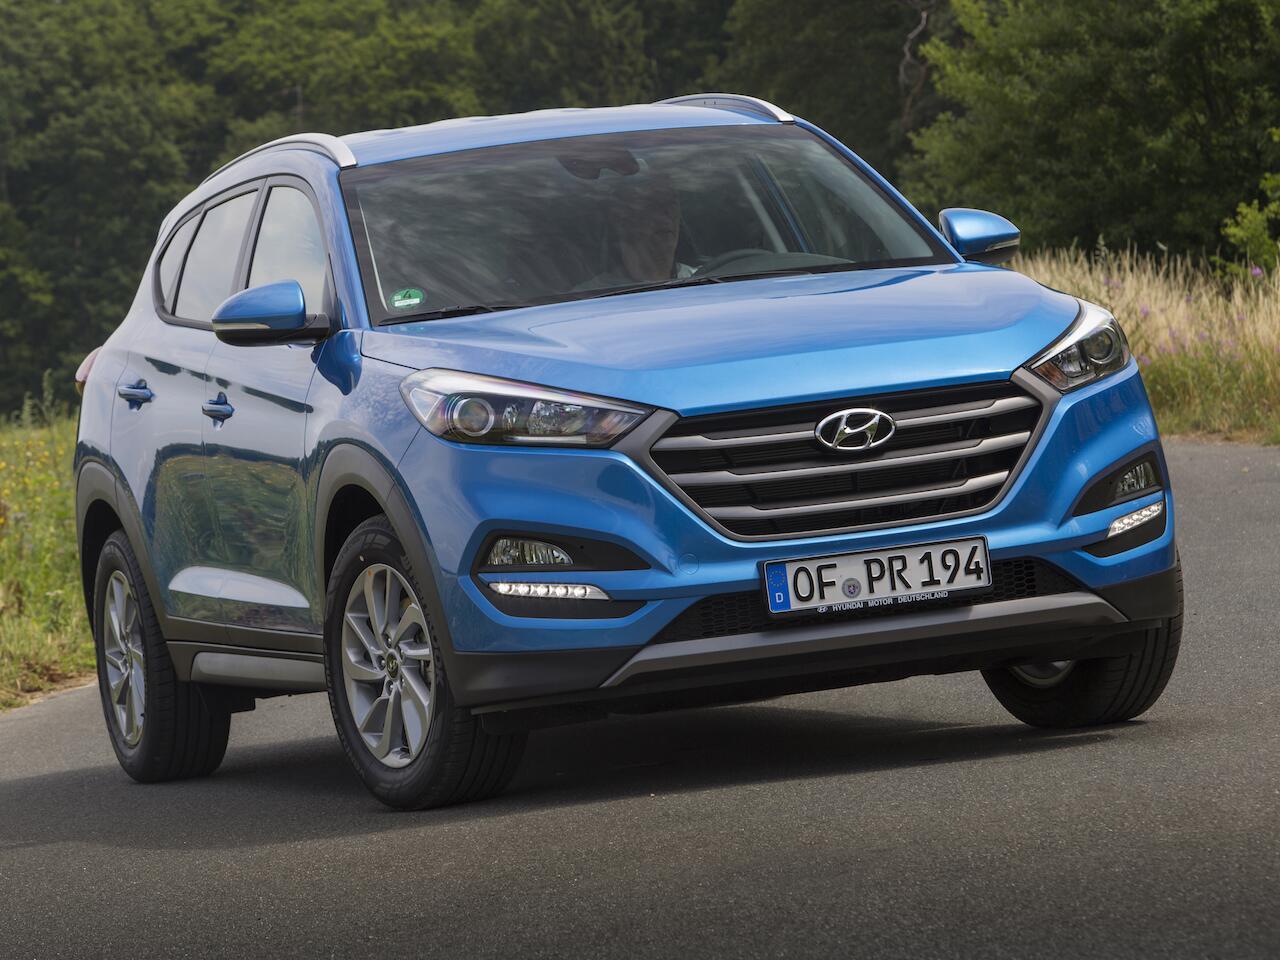 Bild zu Top: Hyundai